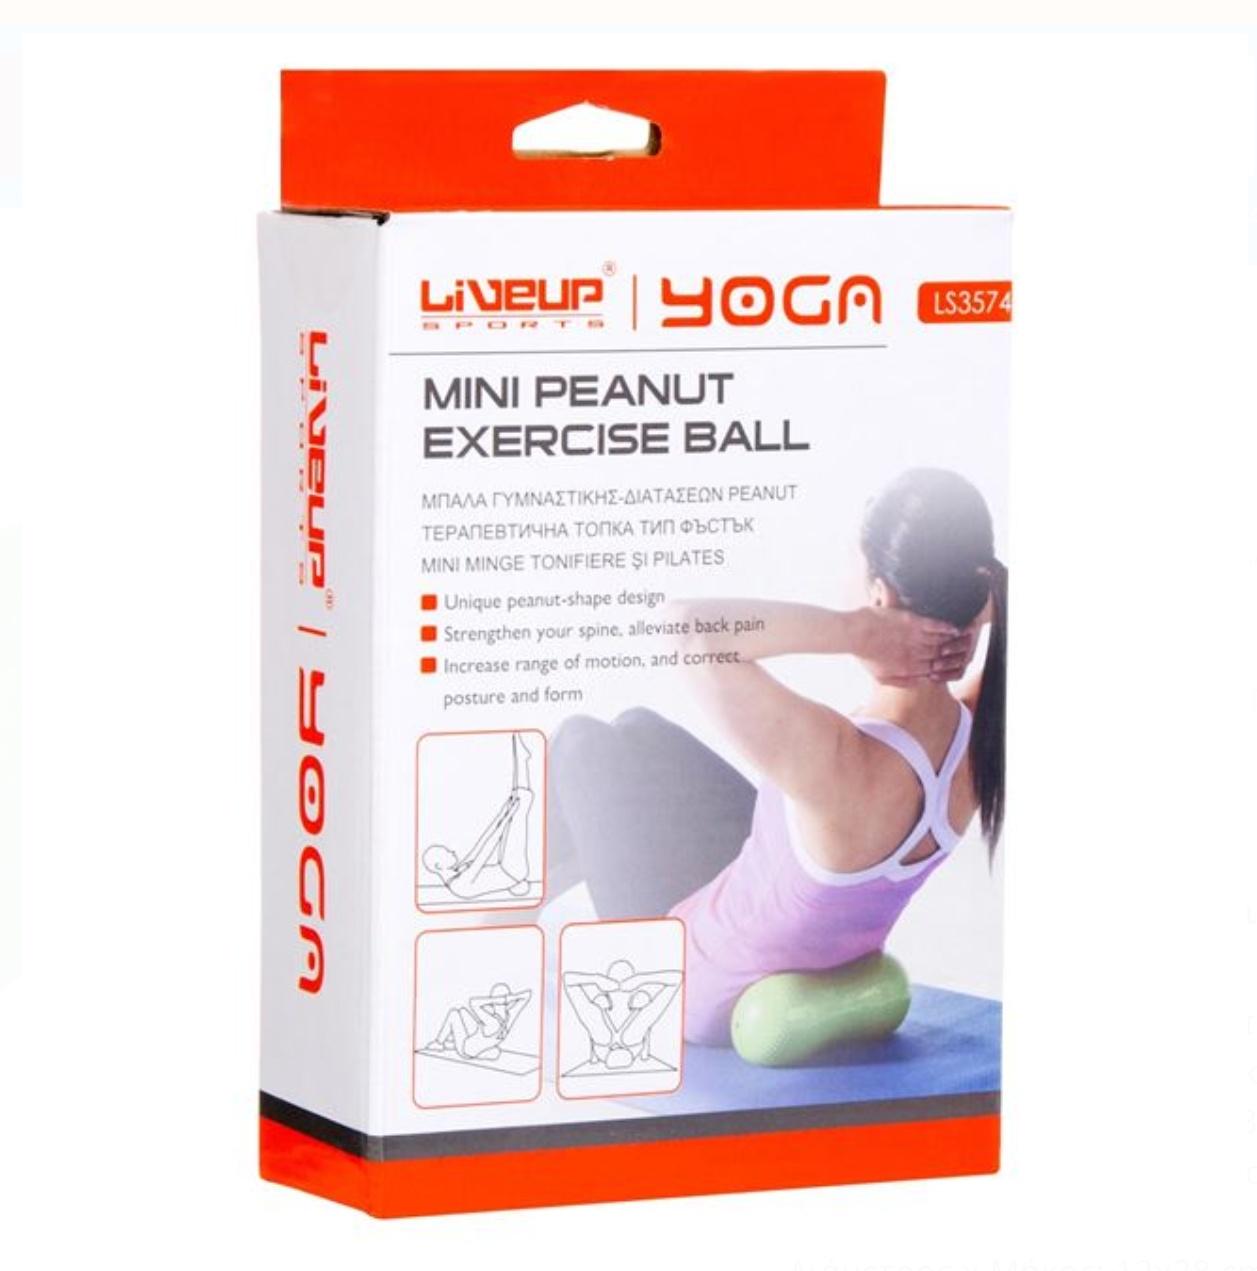 Minge fitness LiveUp Mark.B7, Yoga, Verde, 12x28 cm